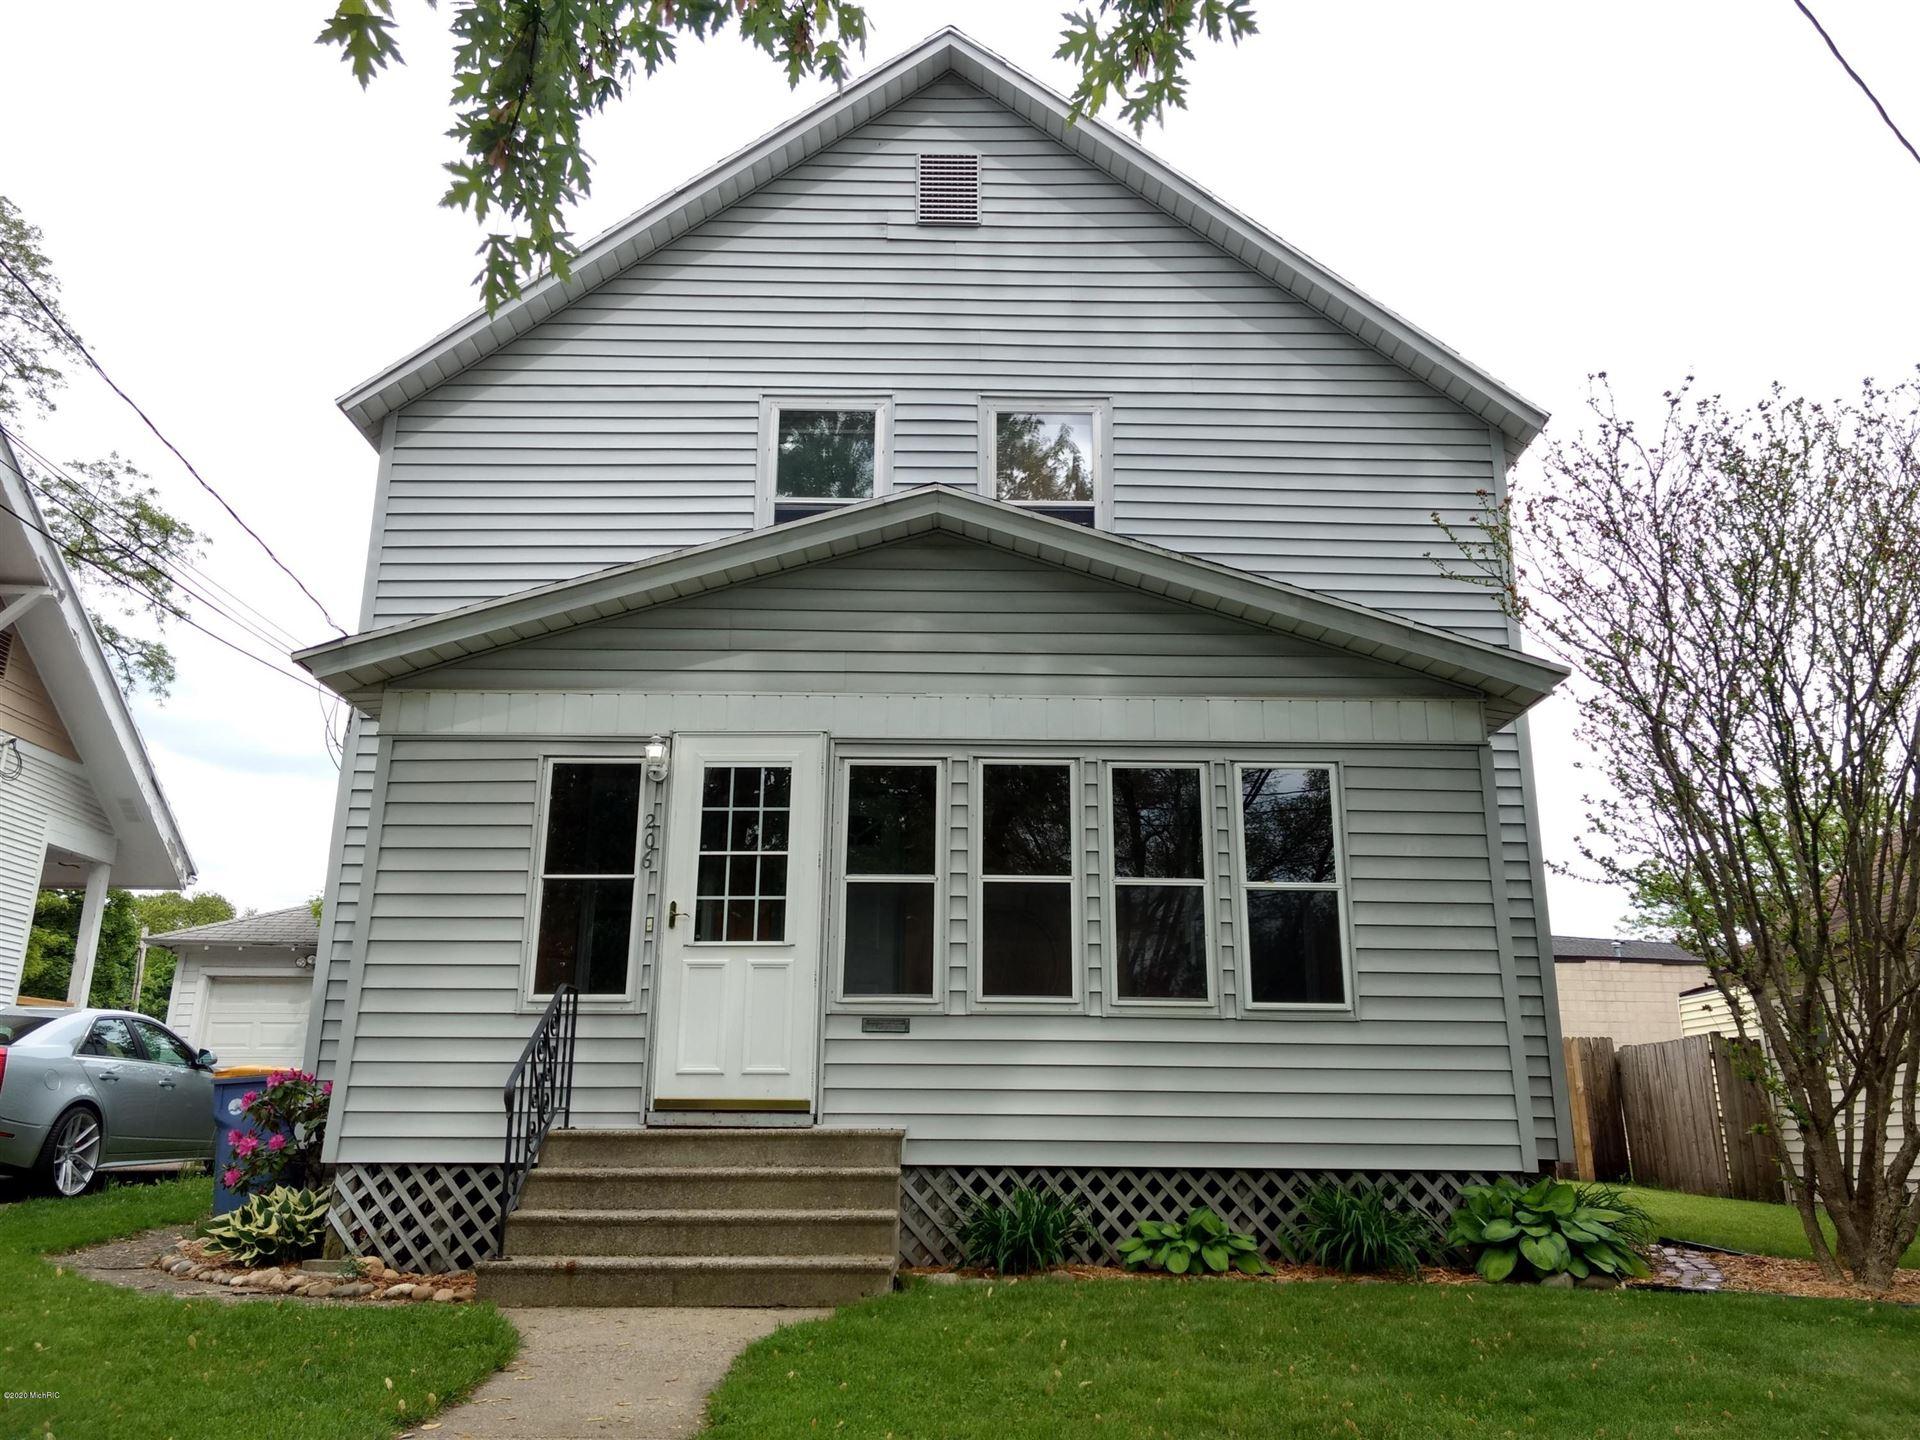 206 Indiana Avenue SW, Grand Rapids, MI 49504 - #: 20015723